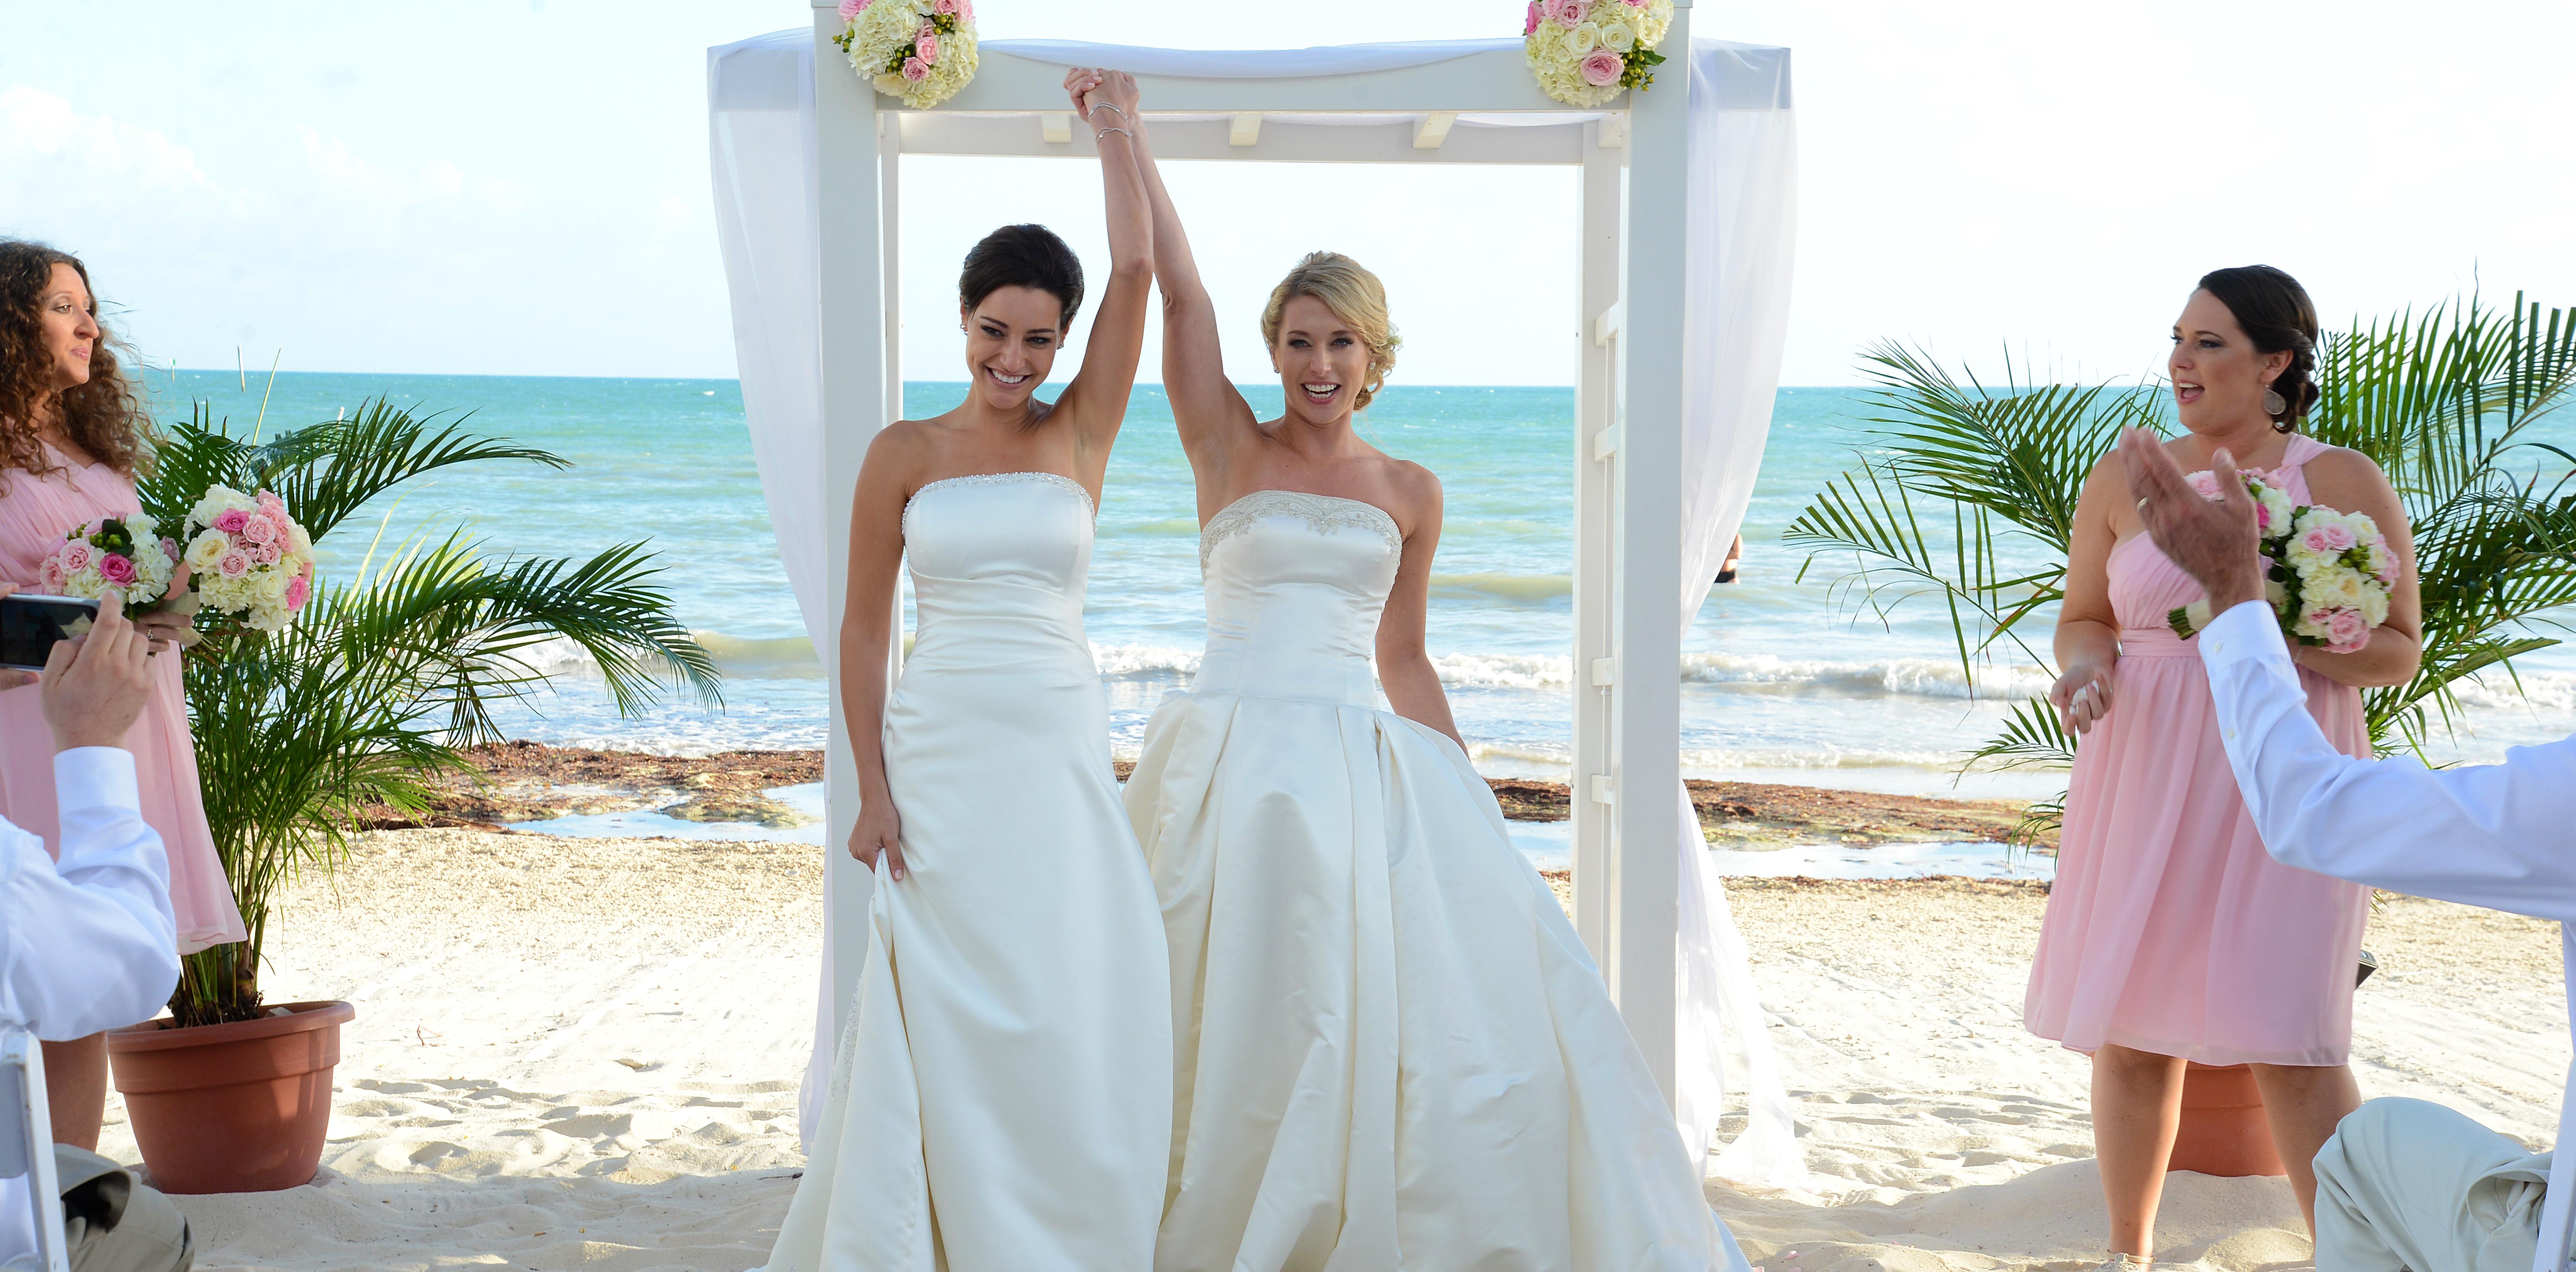 LGBT Weddings South Florida